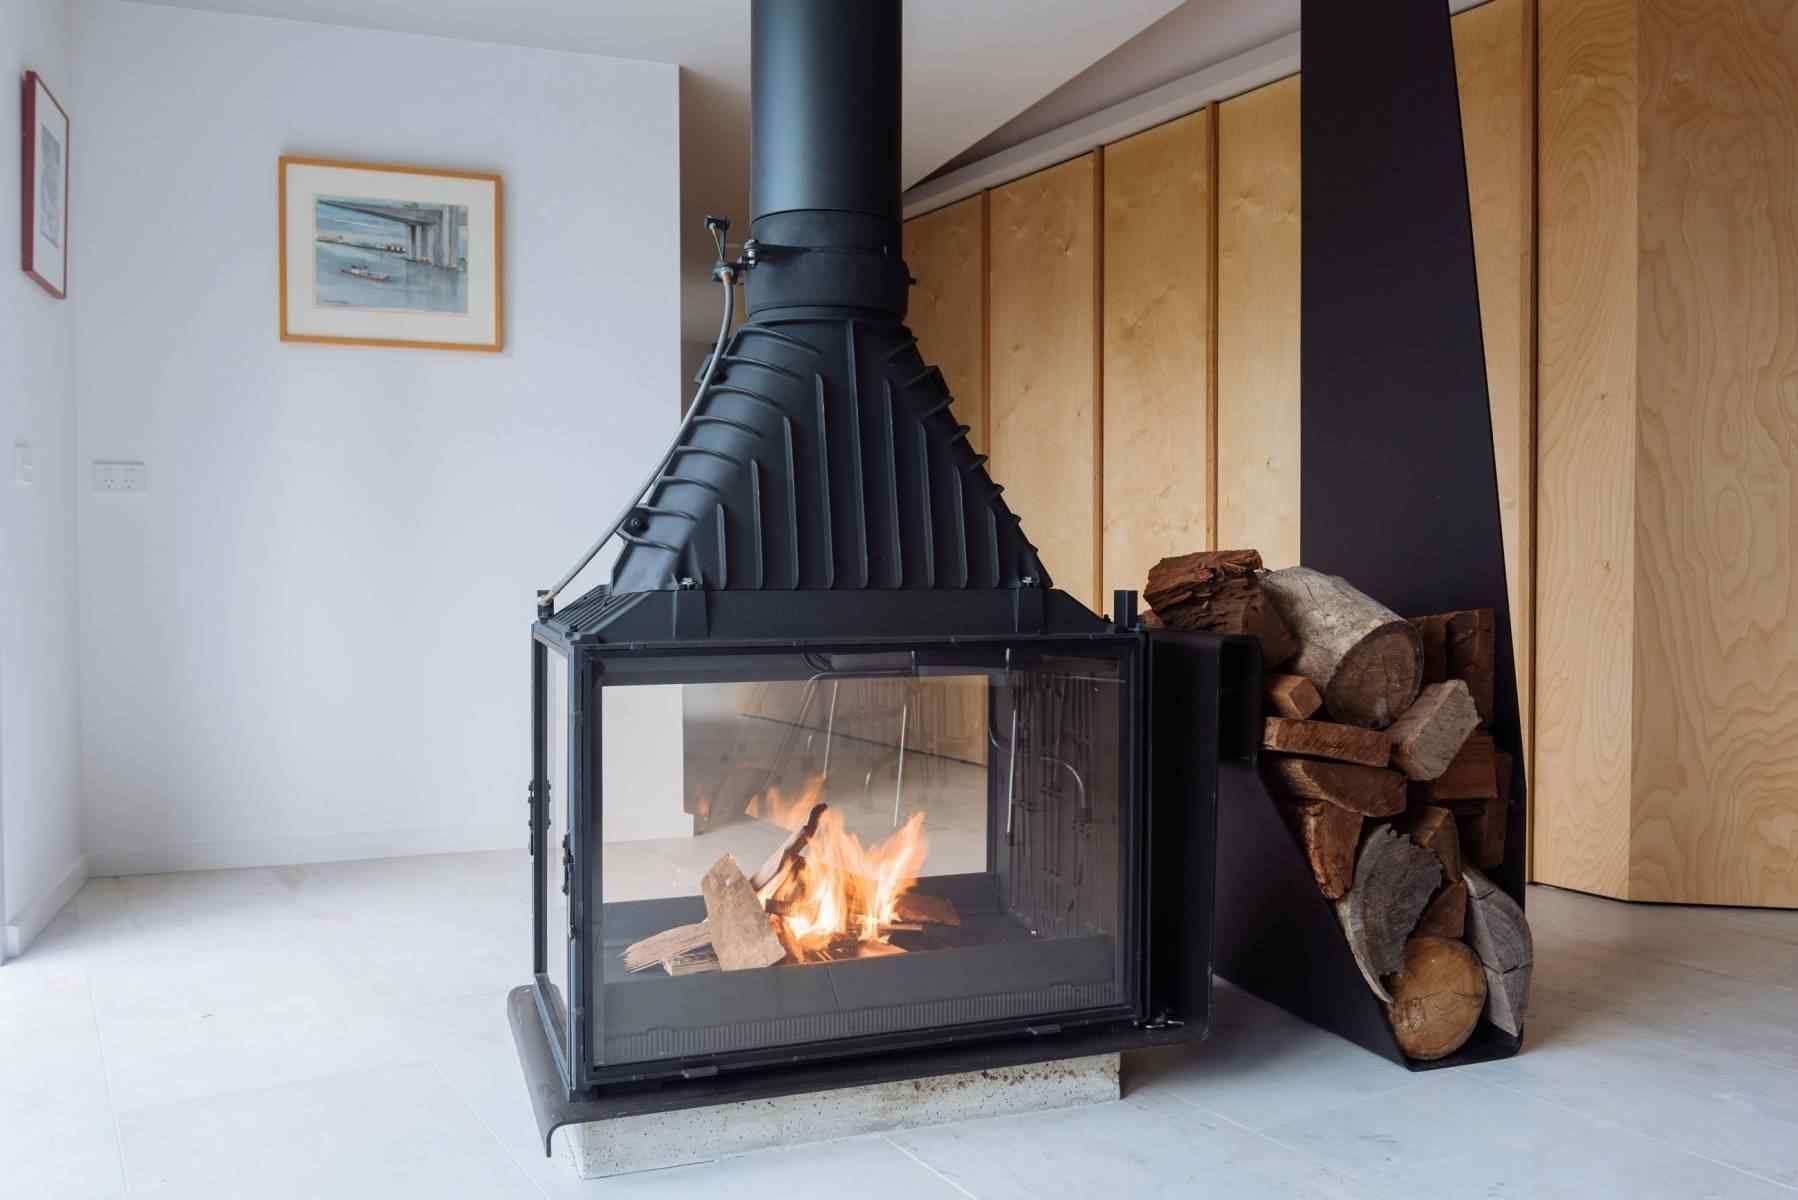 Freestanding Fireplace Designs Cheminees Philippe Australia Australia Cheminees Designs Firepl Freestanding Fireplace Fireplace Design Indoor Fireplace